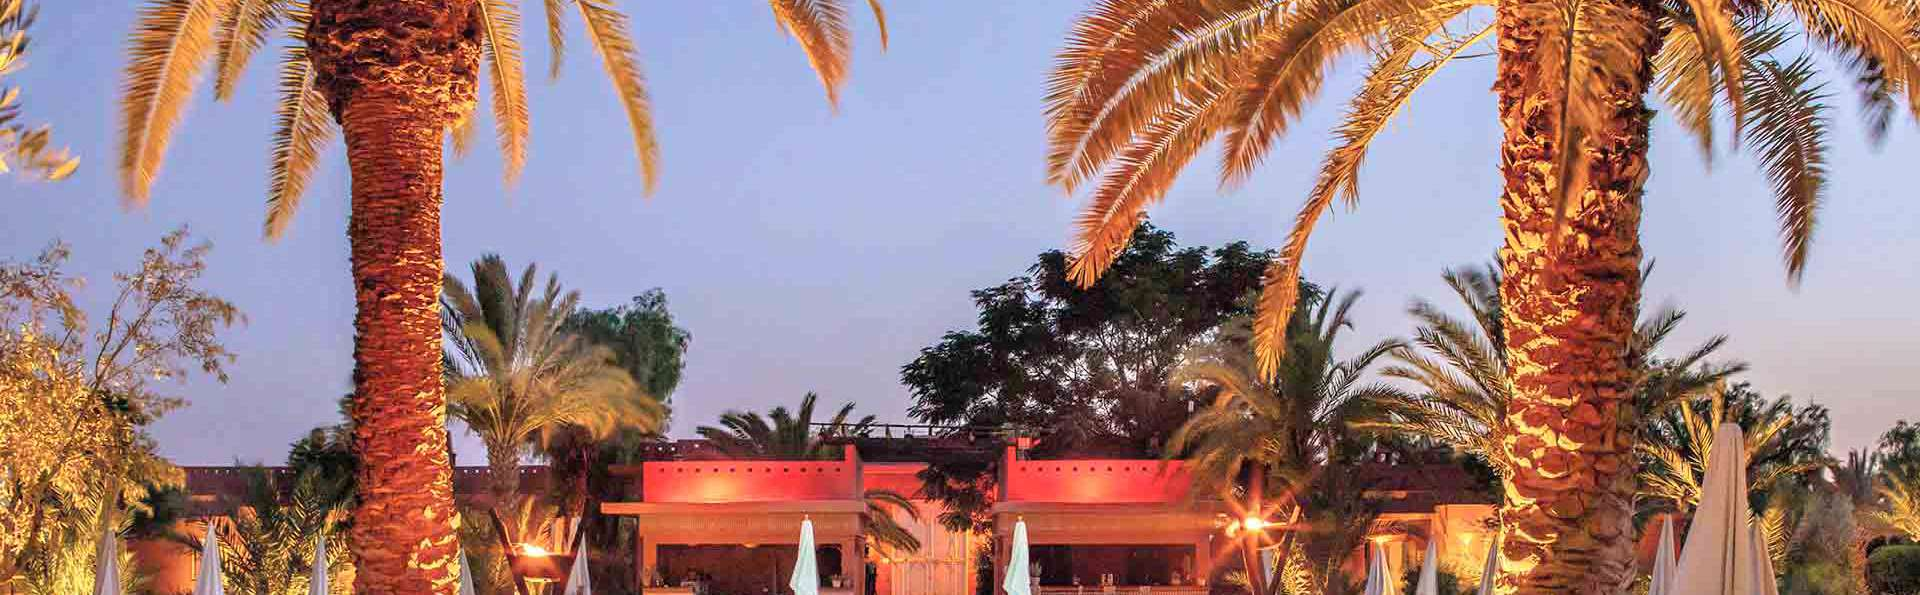 Domaine des Remparts - EDIT_piscine_hotel_marrakech_02.jpg